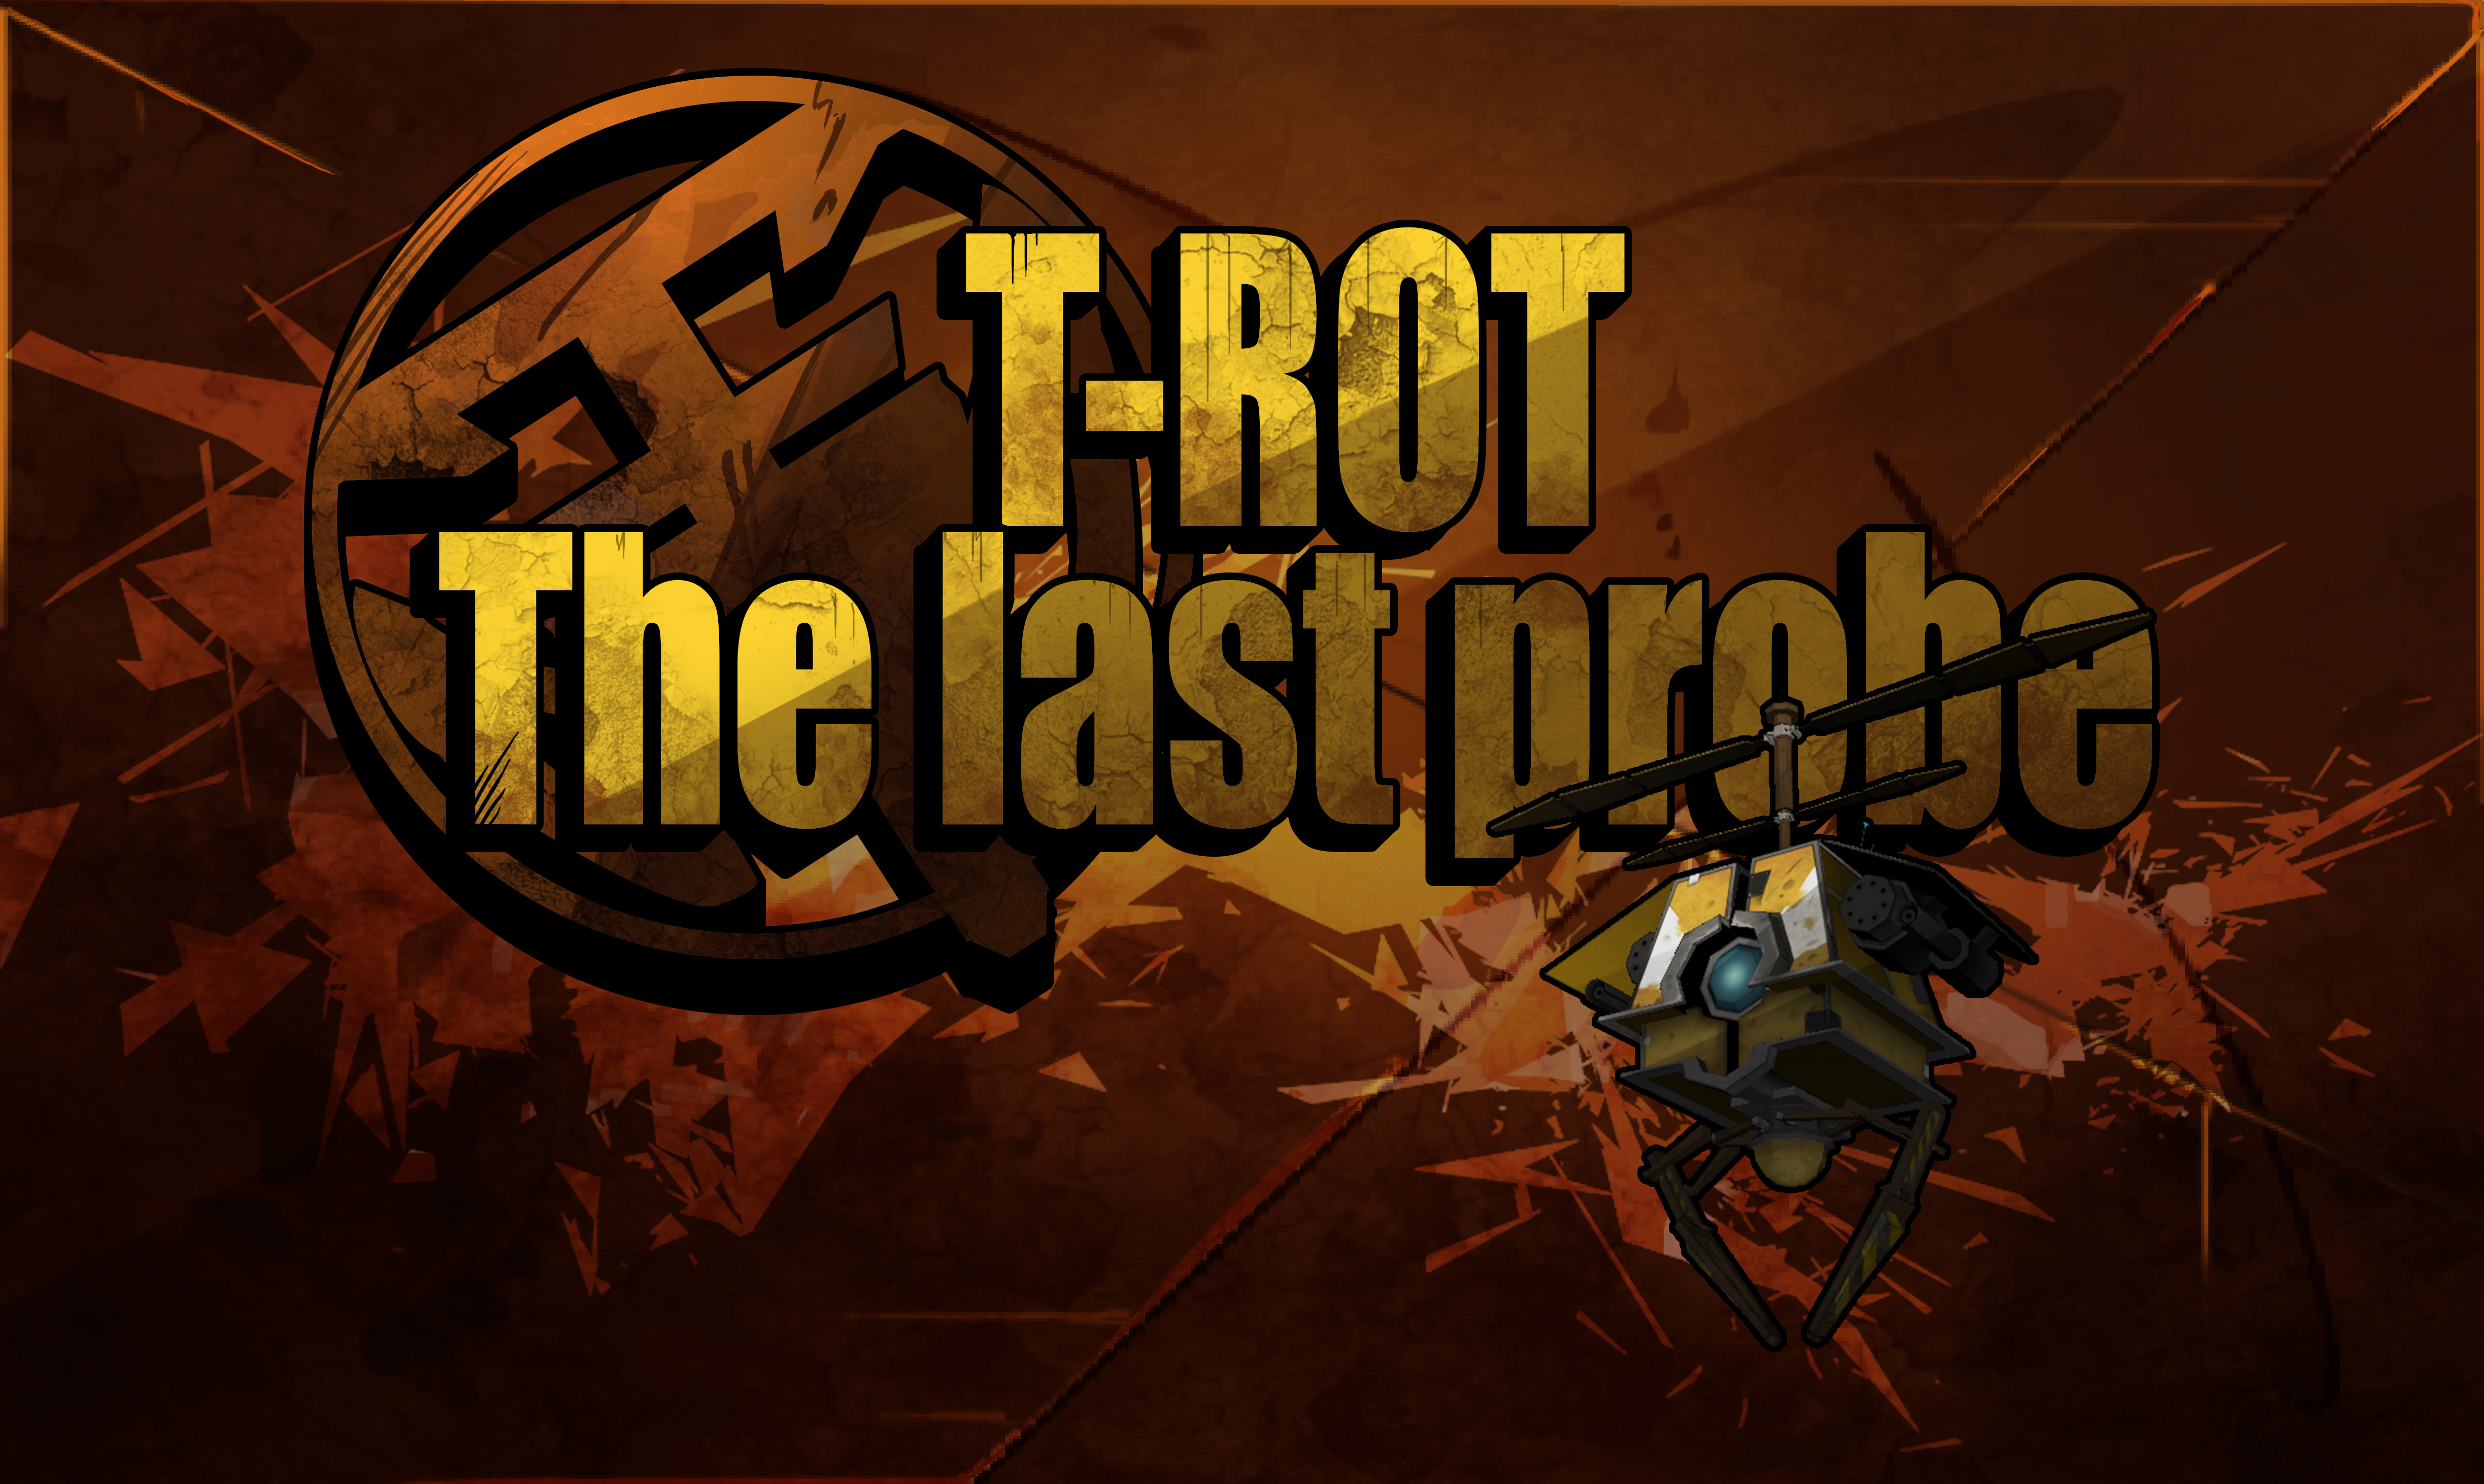 T-ROT THE LAST PROBE